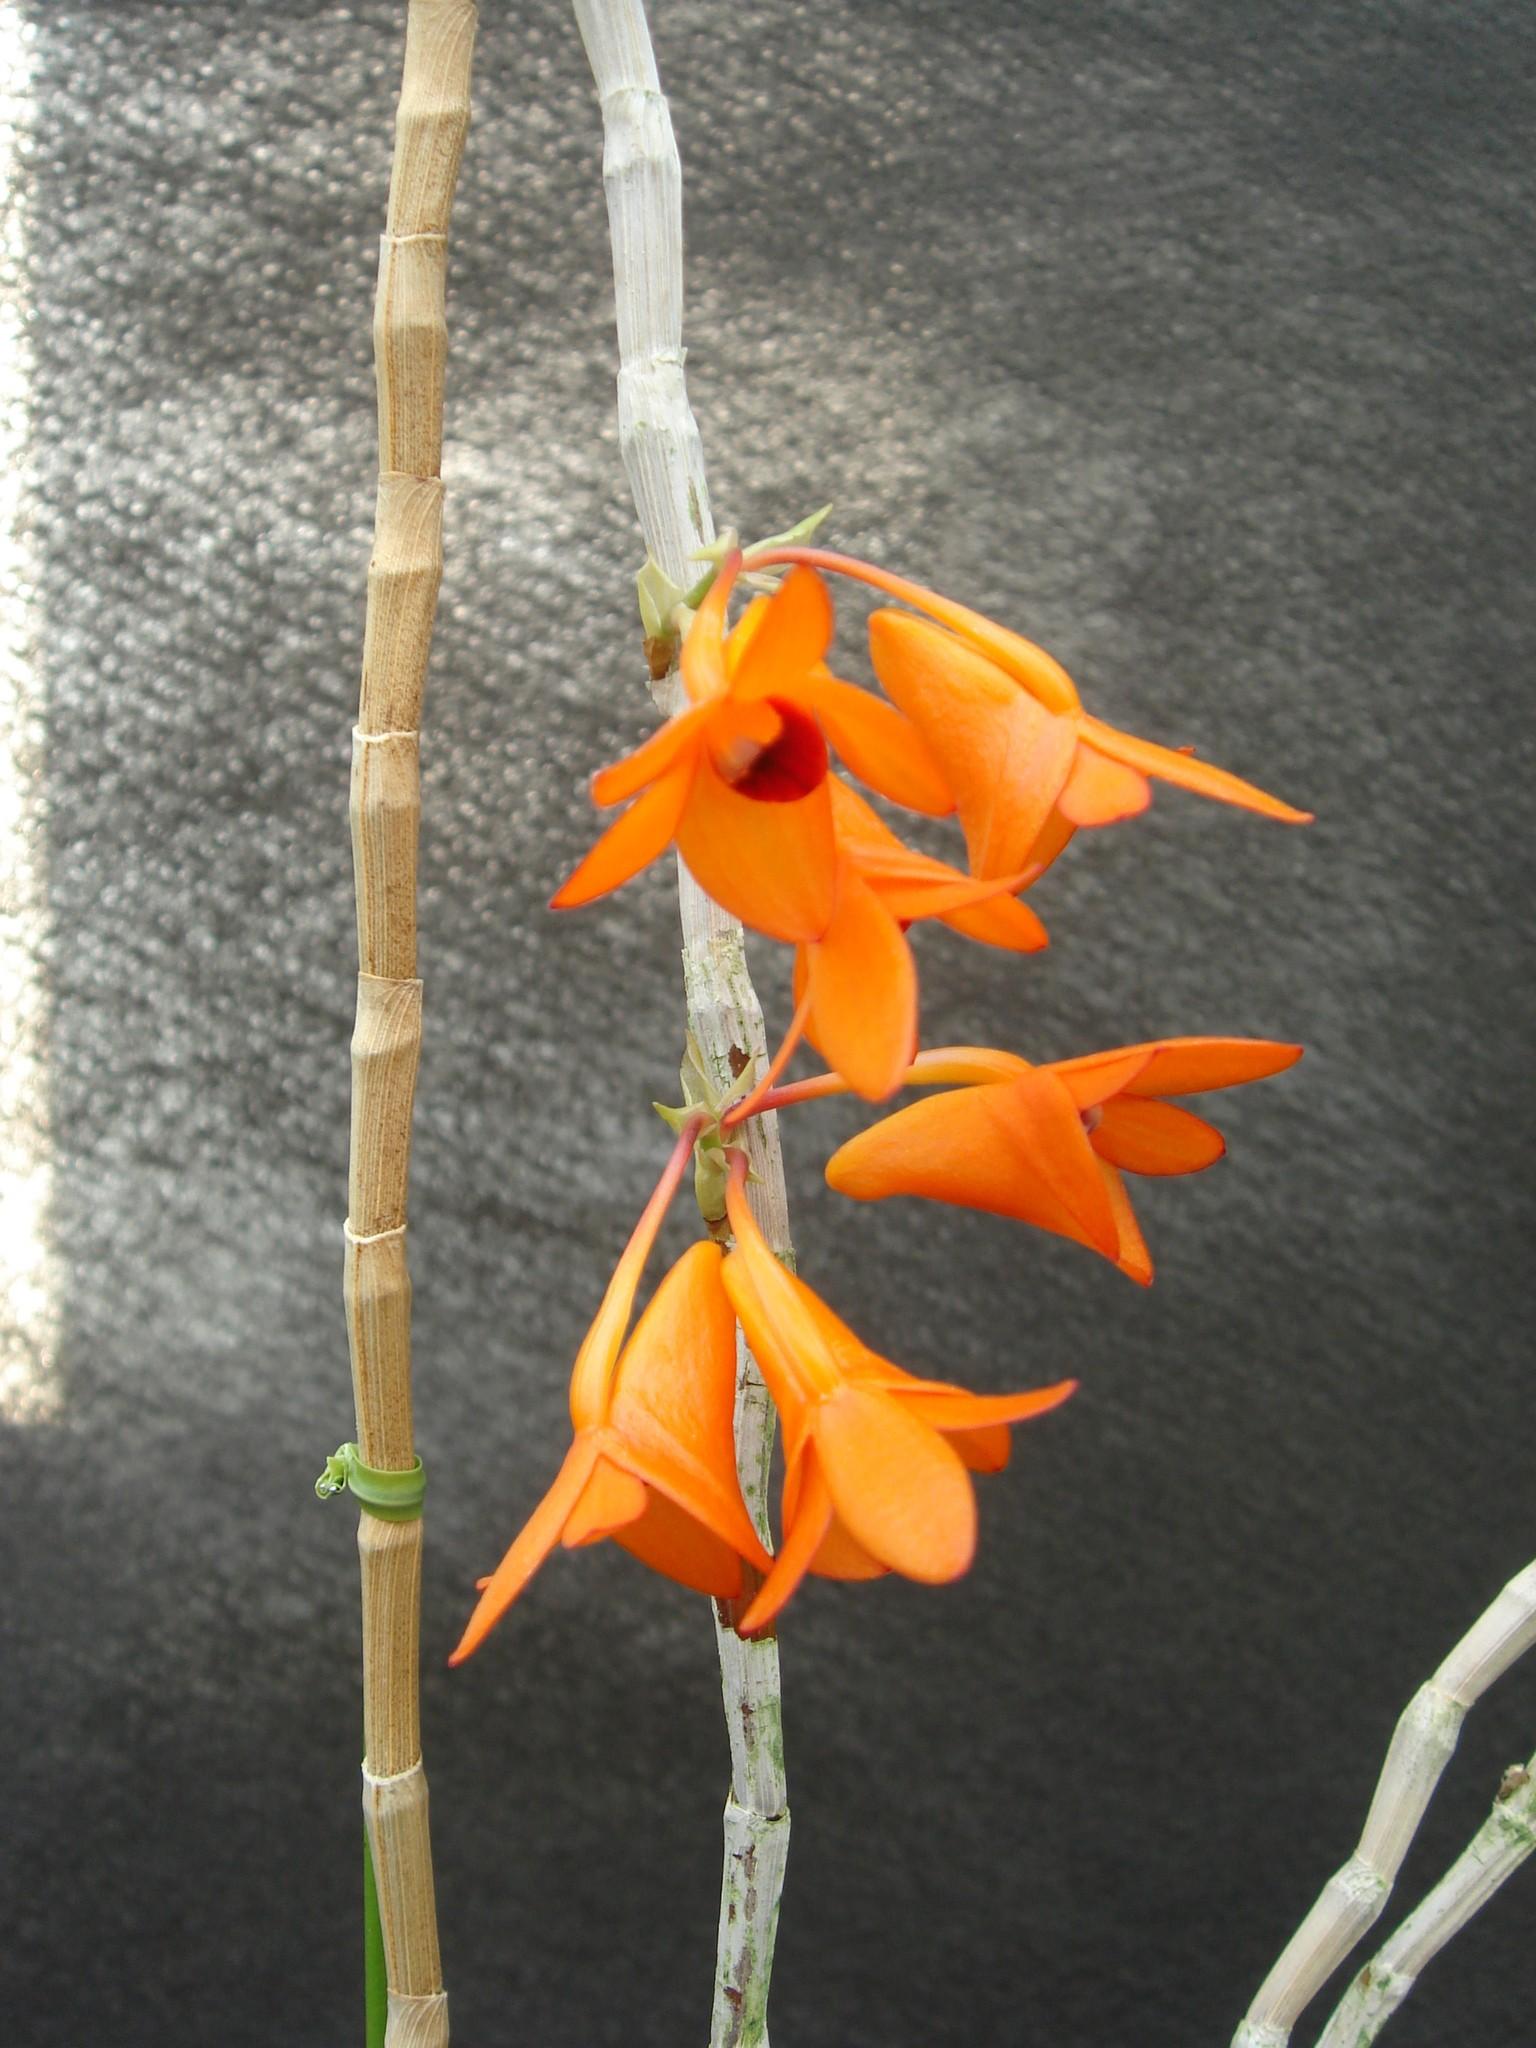 http://orchids.la.coocan.jp/Dendrobium/Dendrobium%20mohlianum/DSC08902.JPG